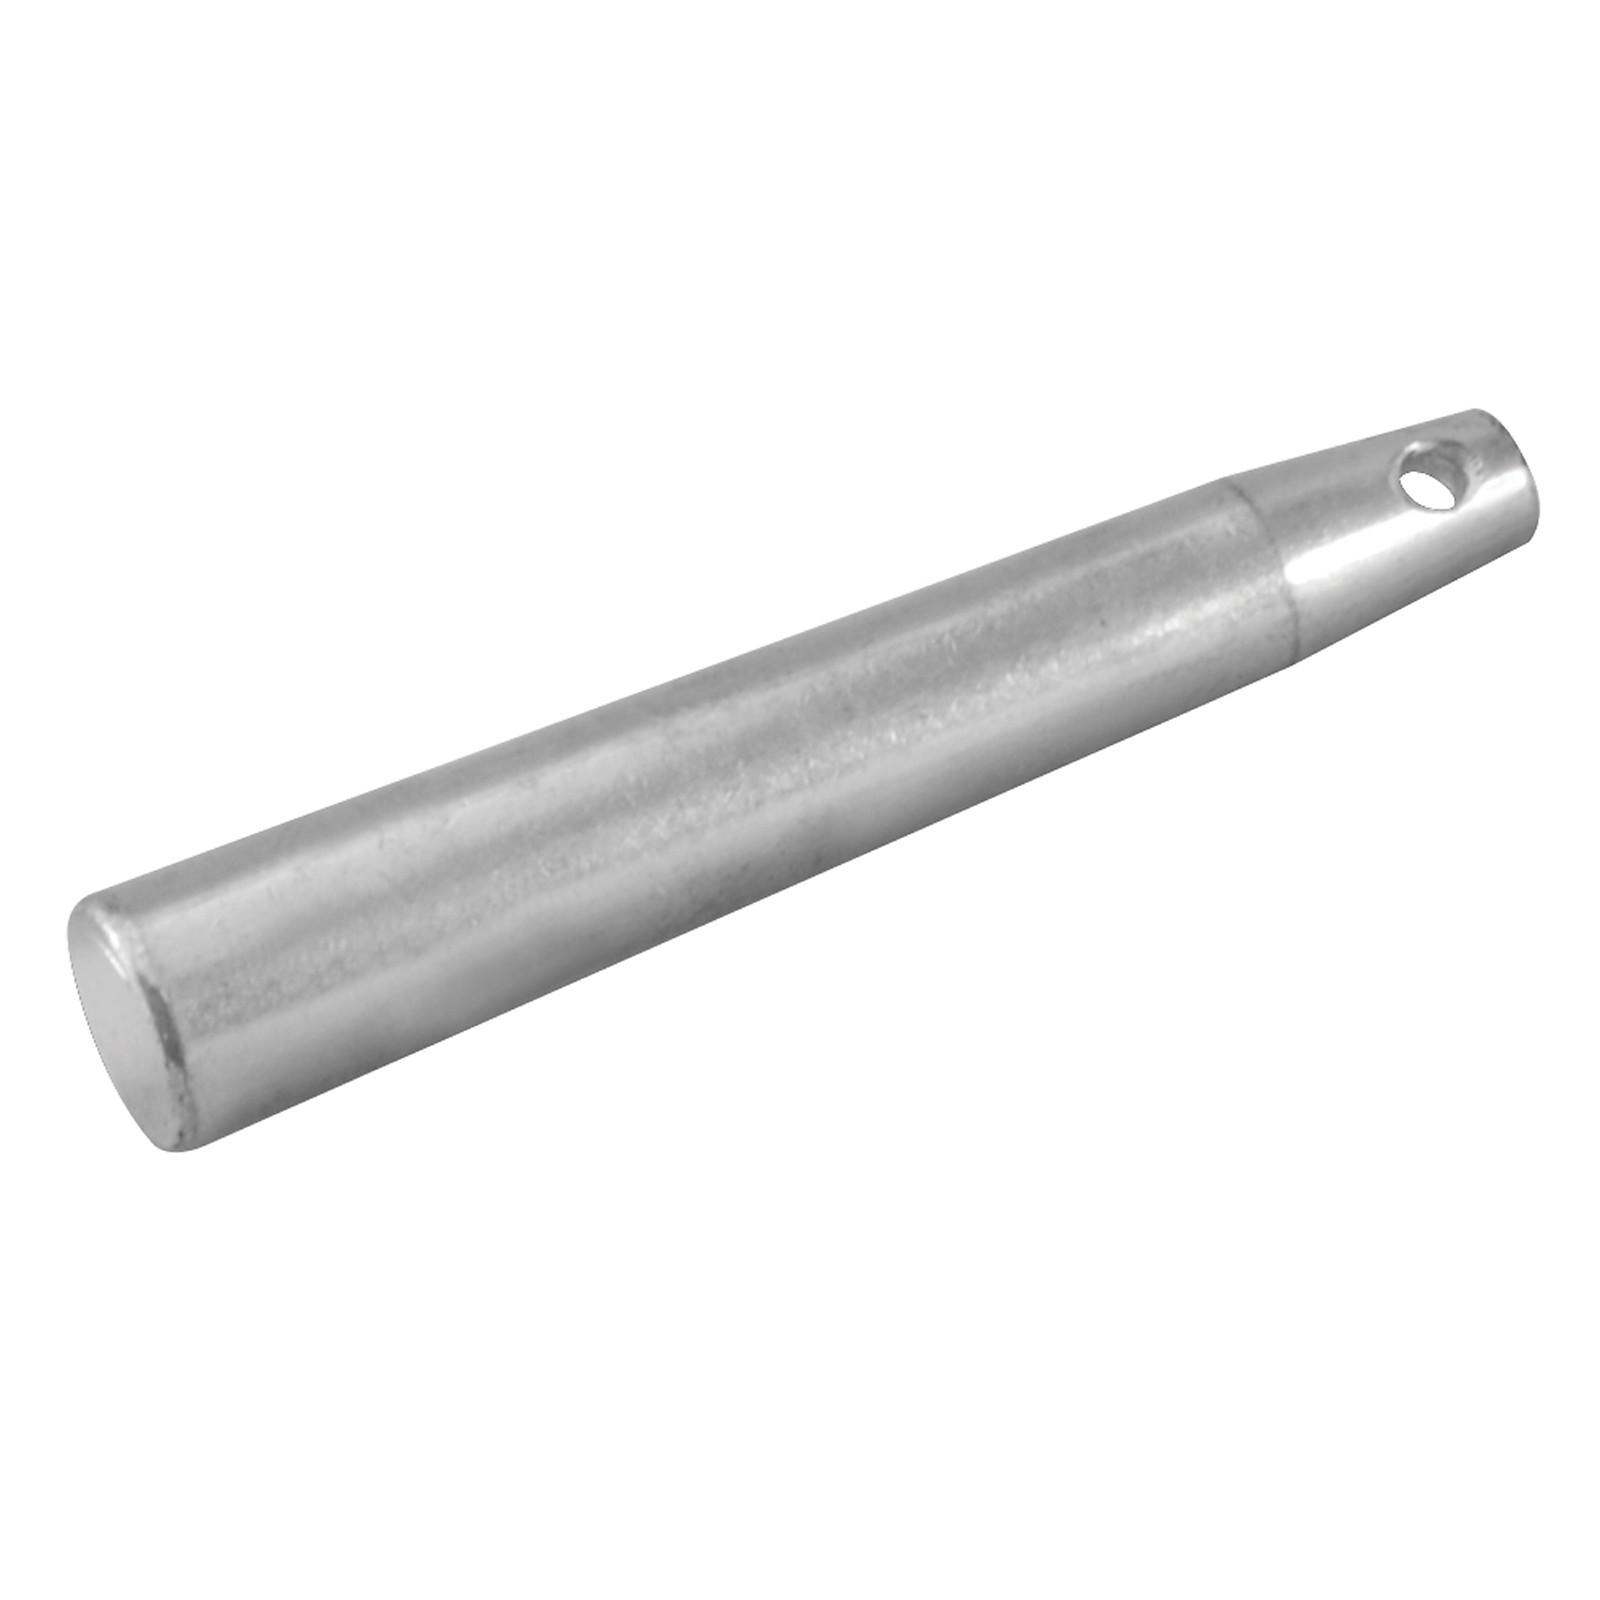 TRUSST Trusst Spare Spigots and Safety Pins